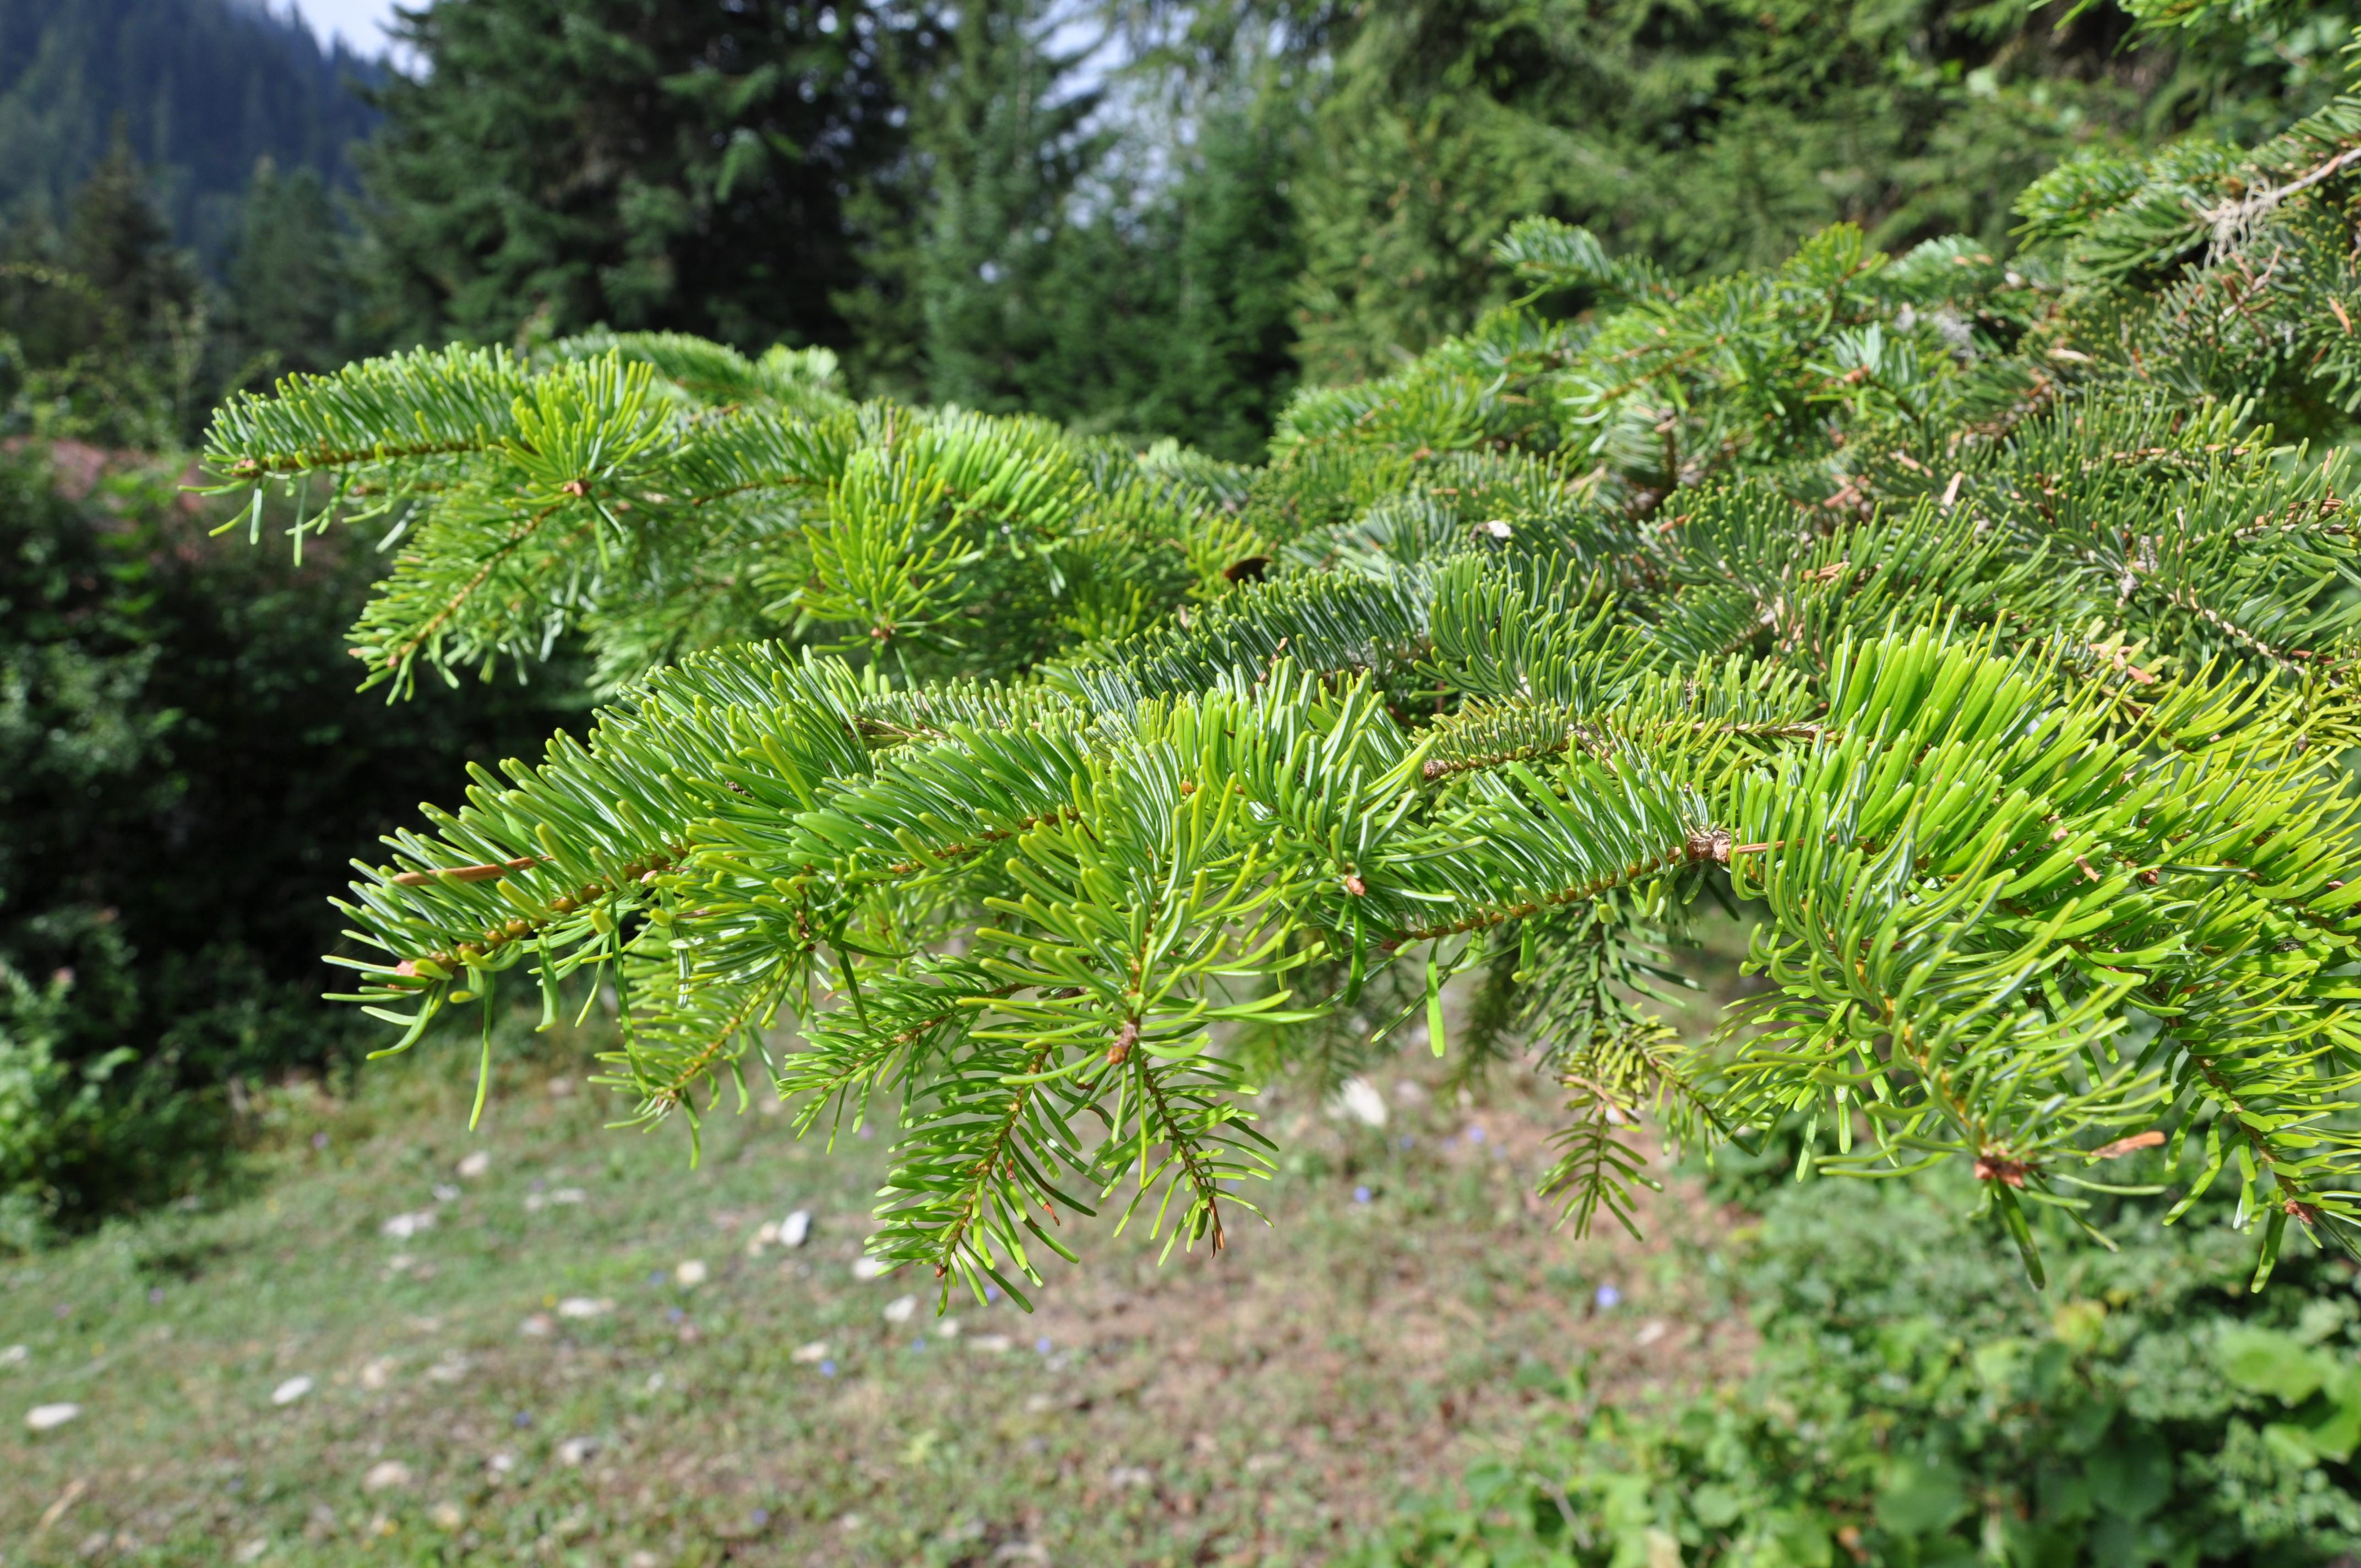 Modelling mooseforest interactions under different predation scenarios